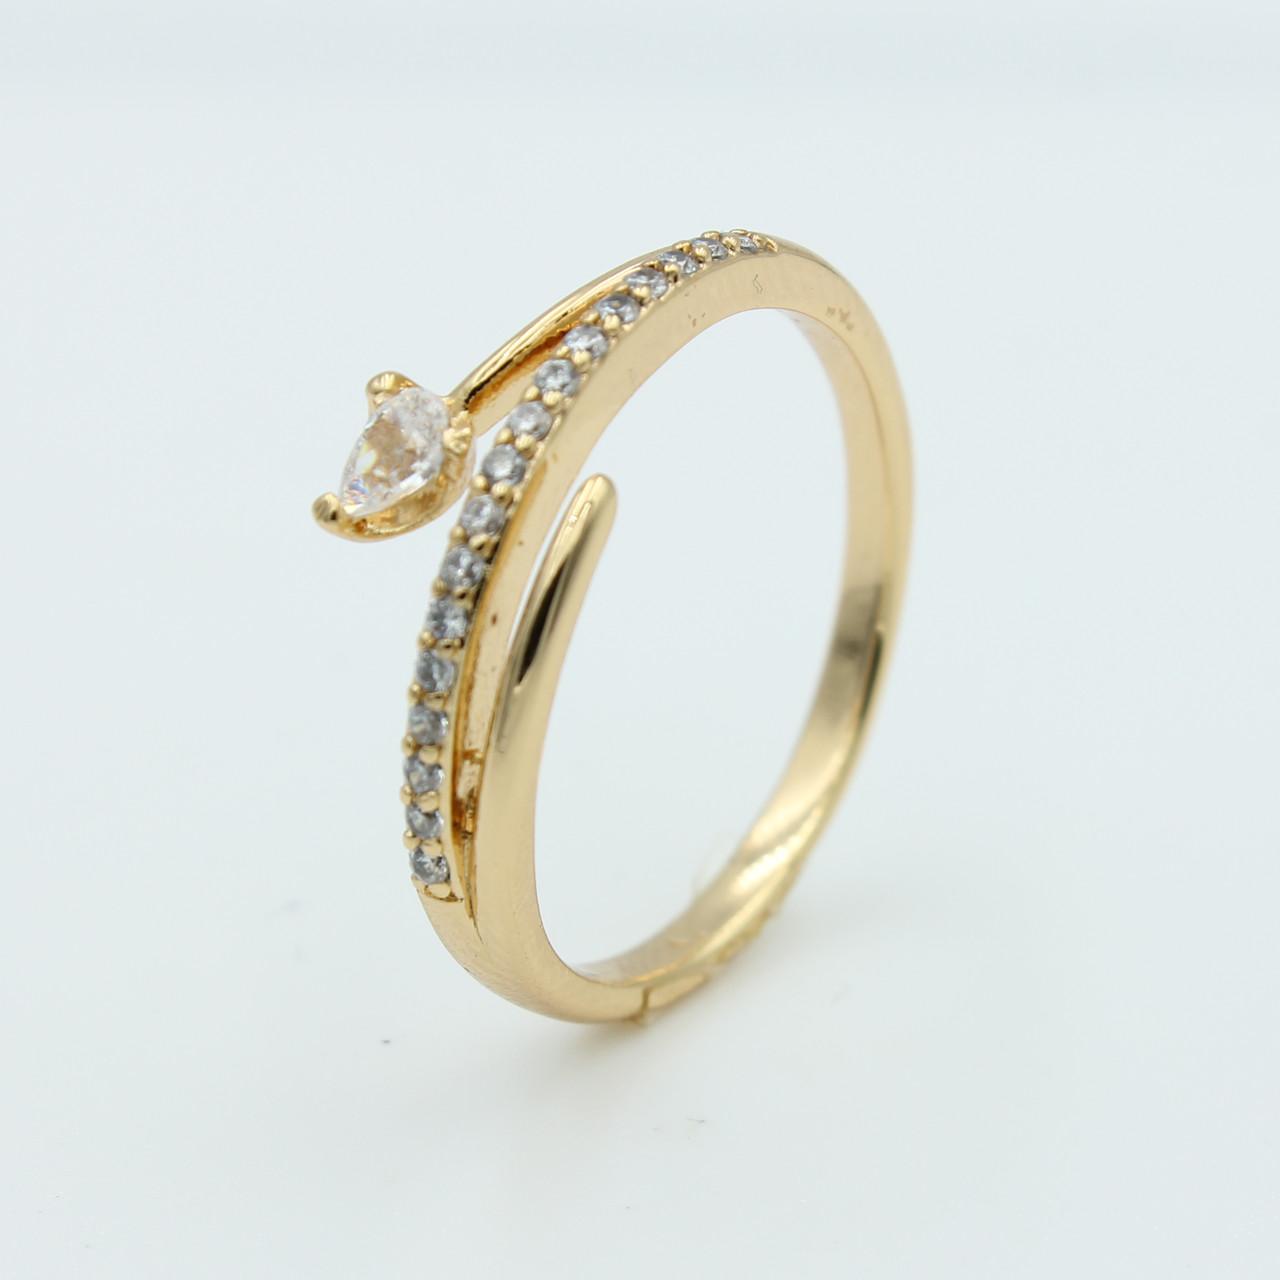 Кольцо Xuping для девушек с камнями Алира, позолота